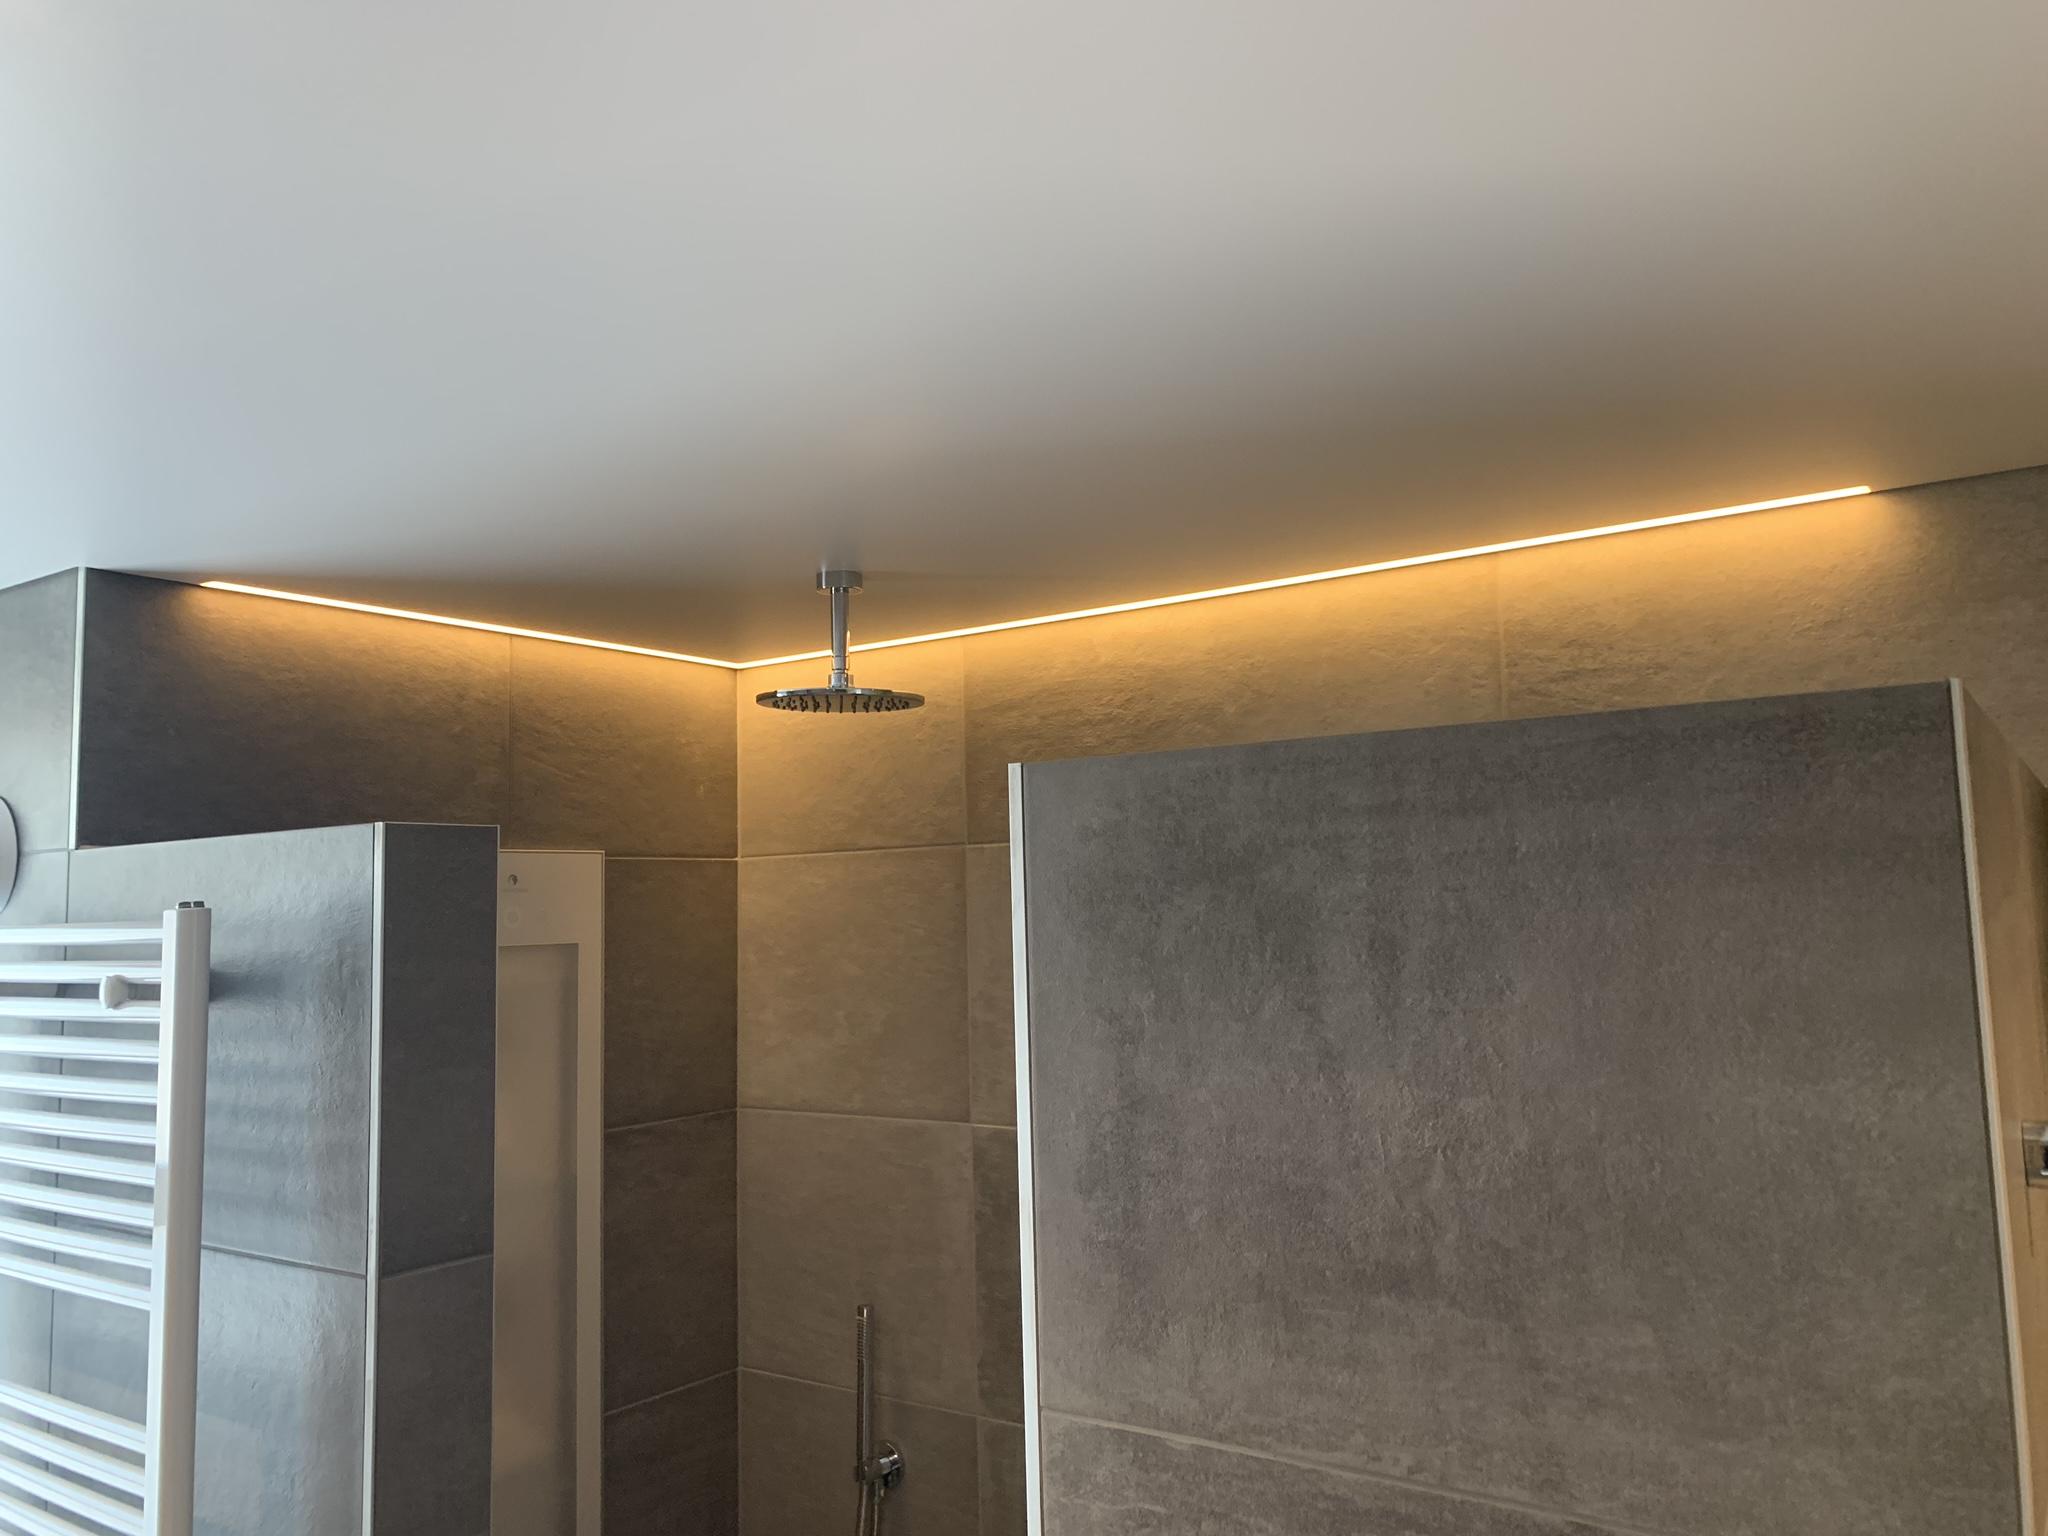 matwit spanplafond met rand LED verlichting